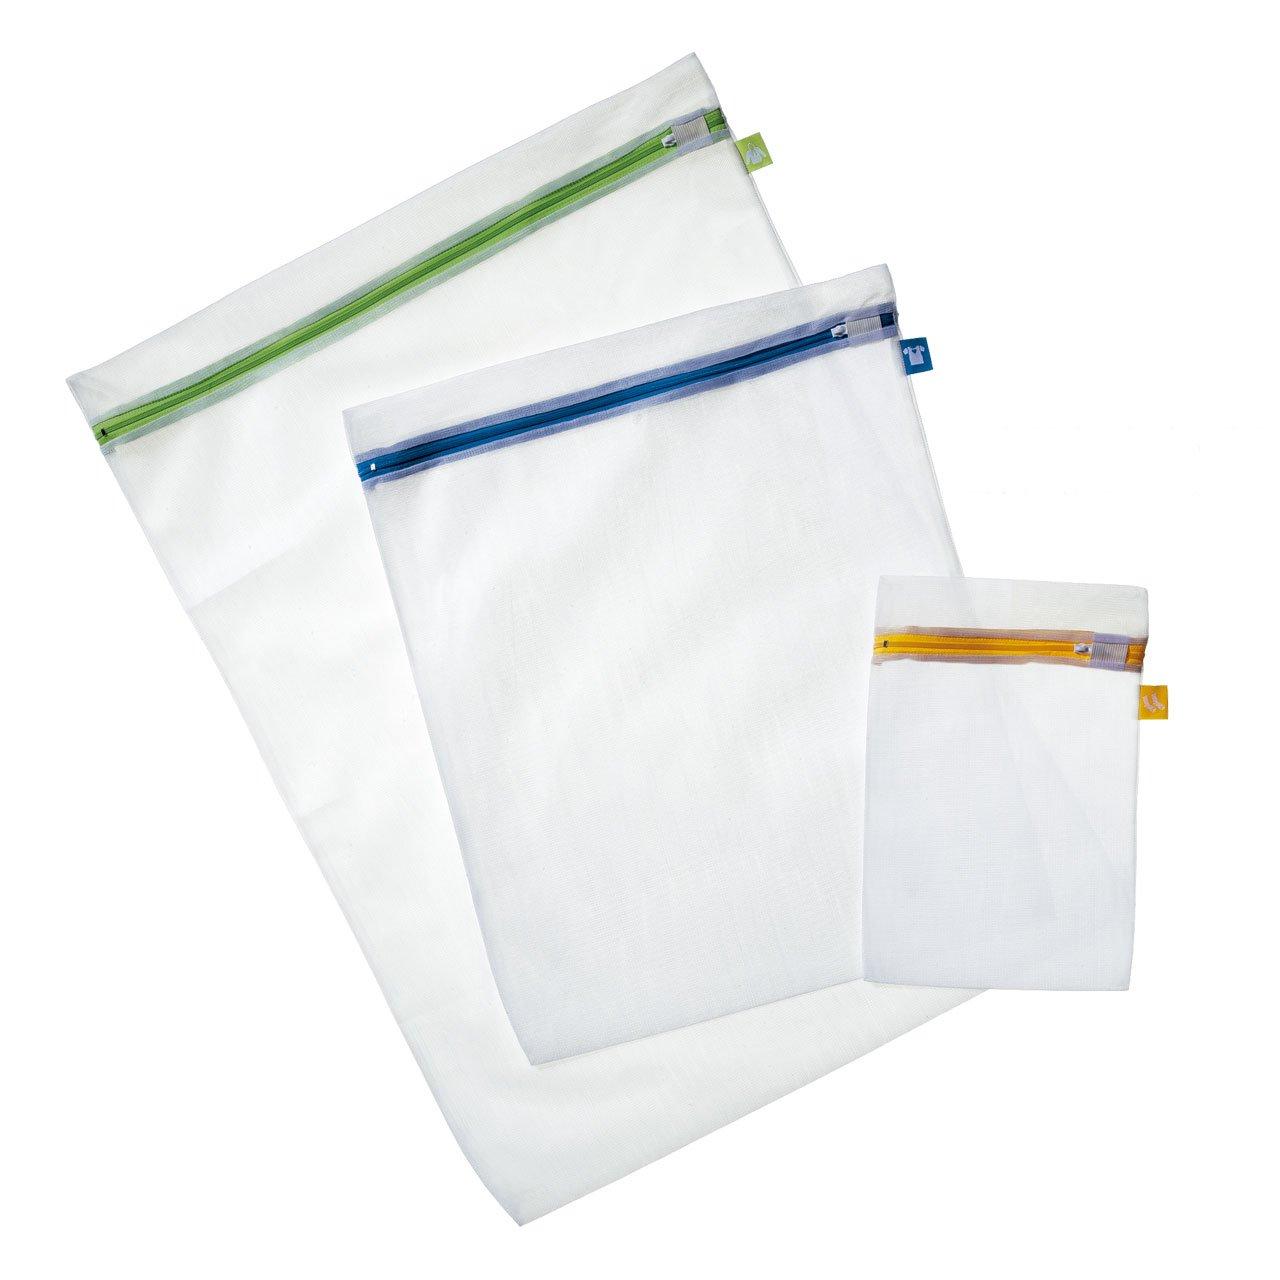 Rayen 6087 - Set de 3 bolsas malla para proteger ropa en la lavadora, material